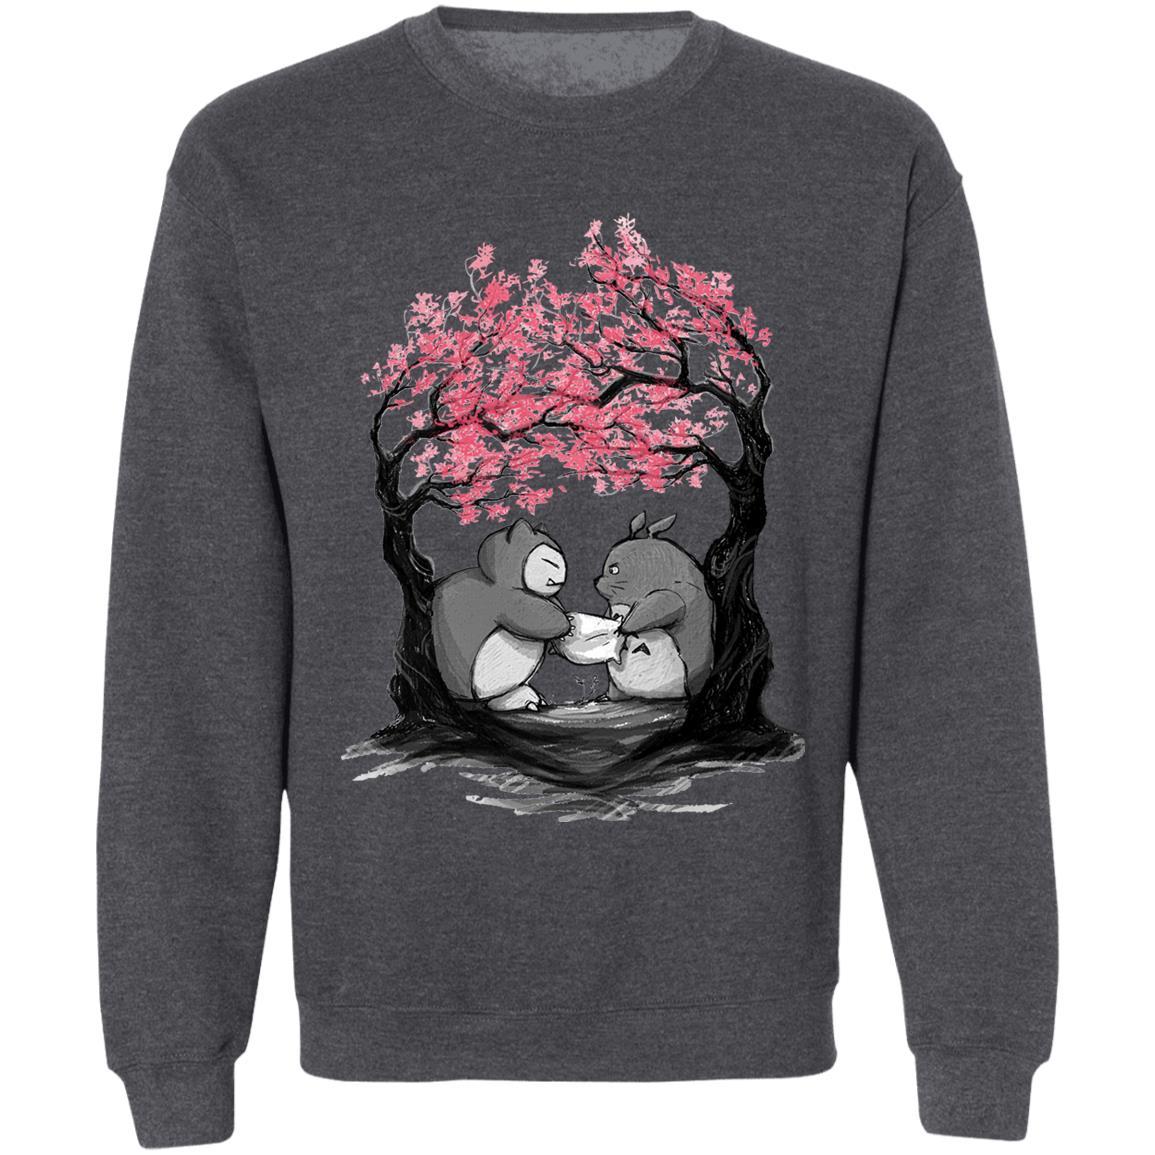 Totoro vs Snorlax Pillow fight Sweatshirt